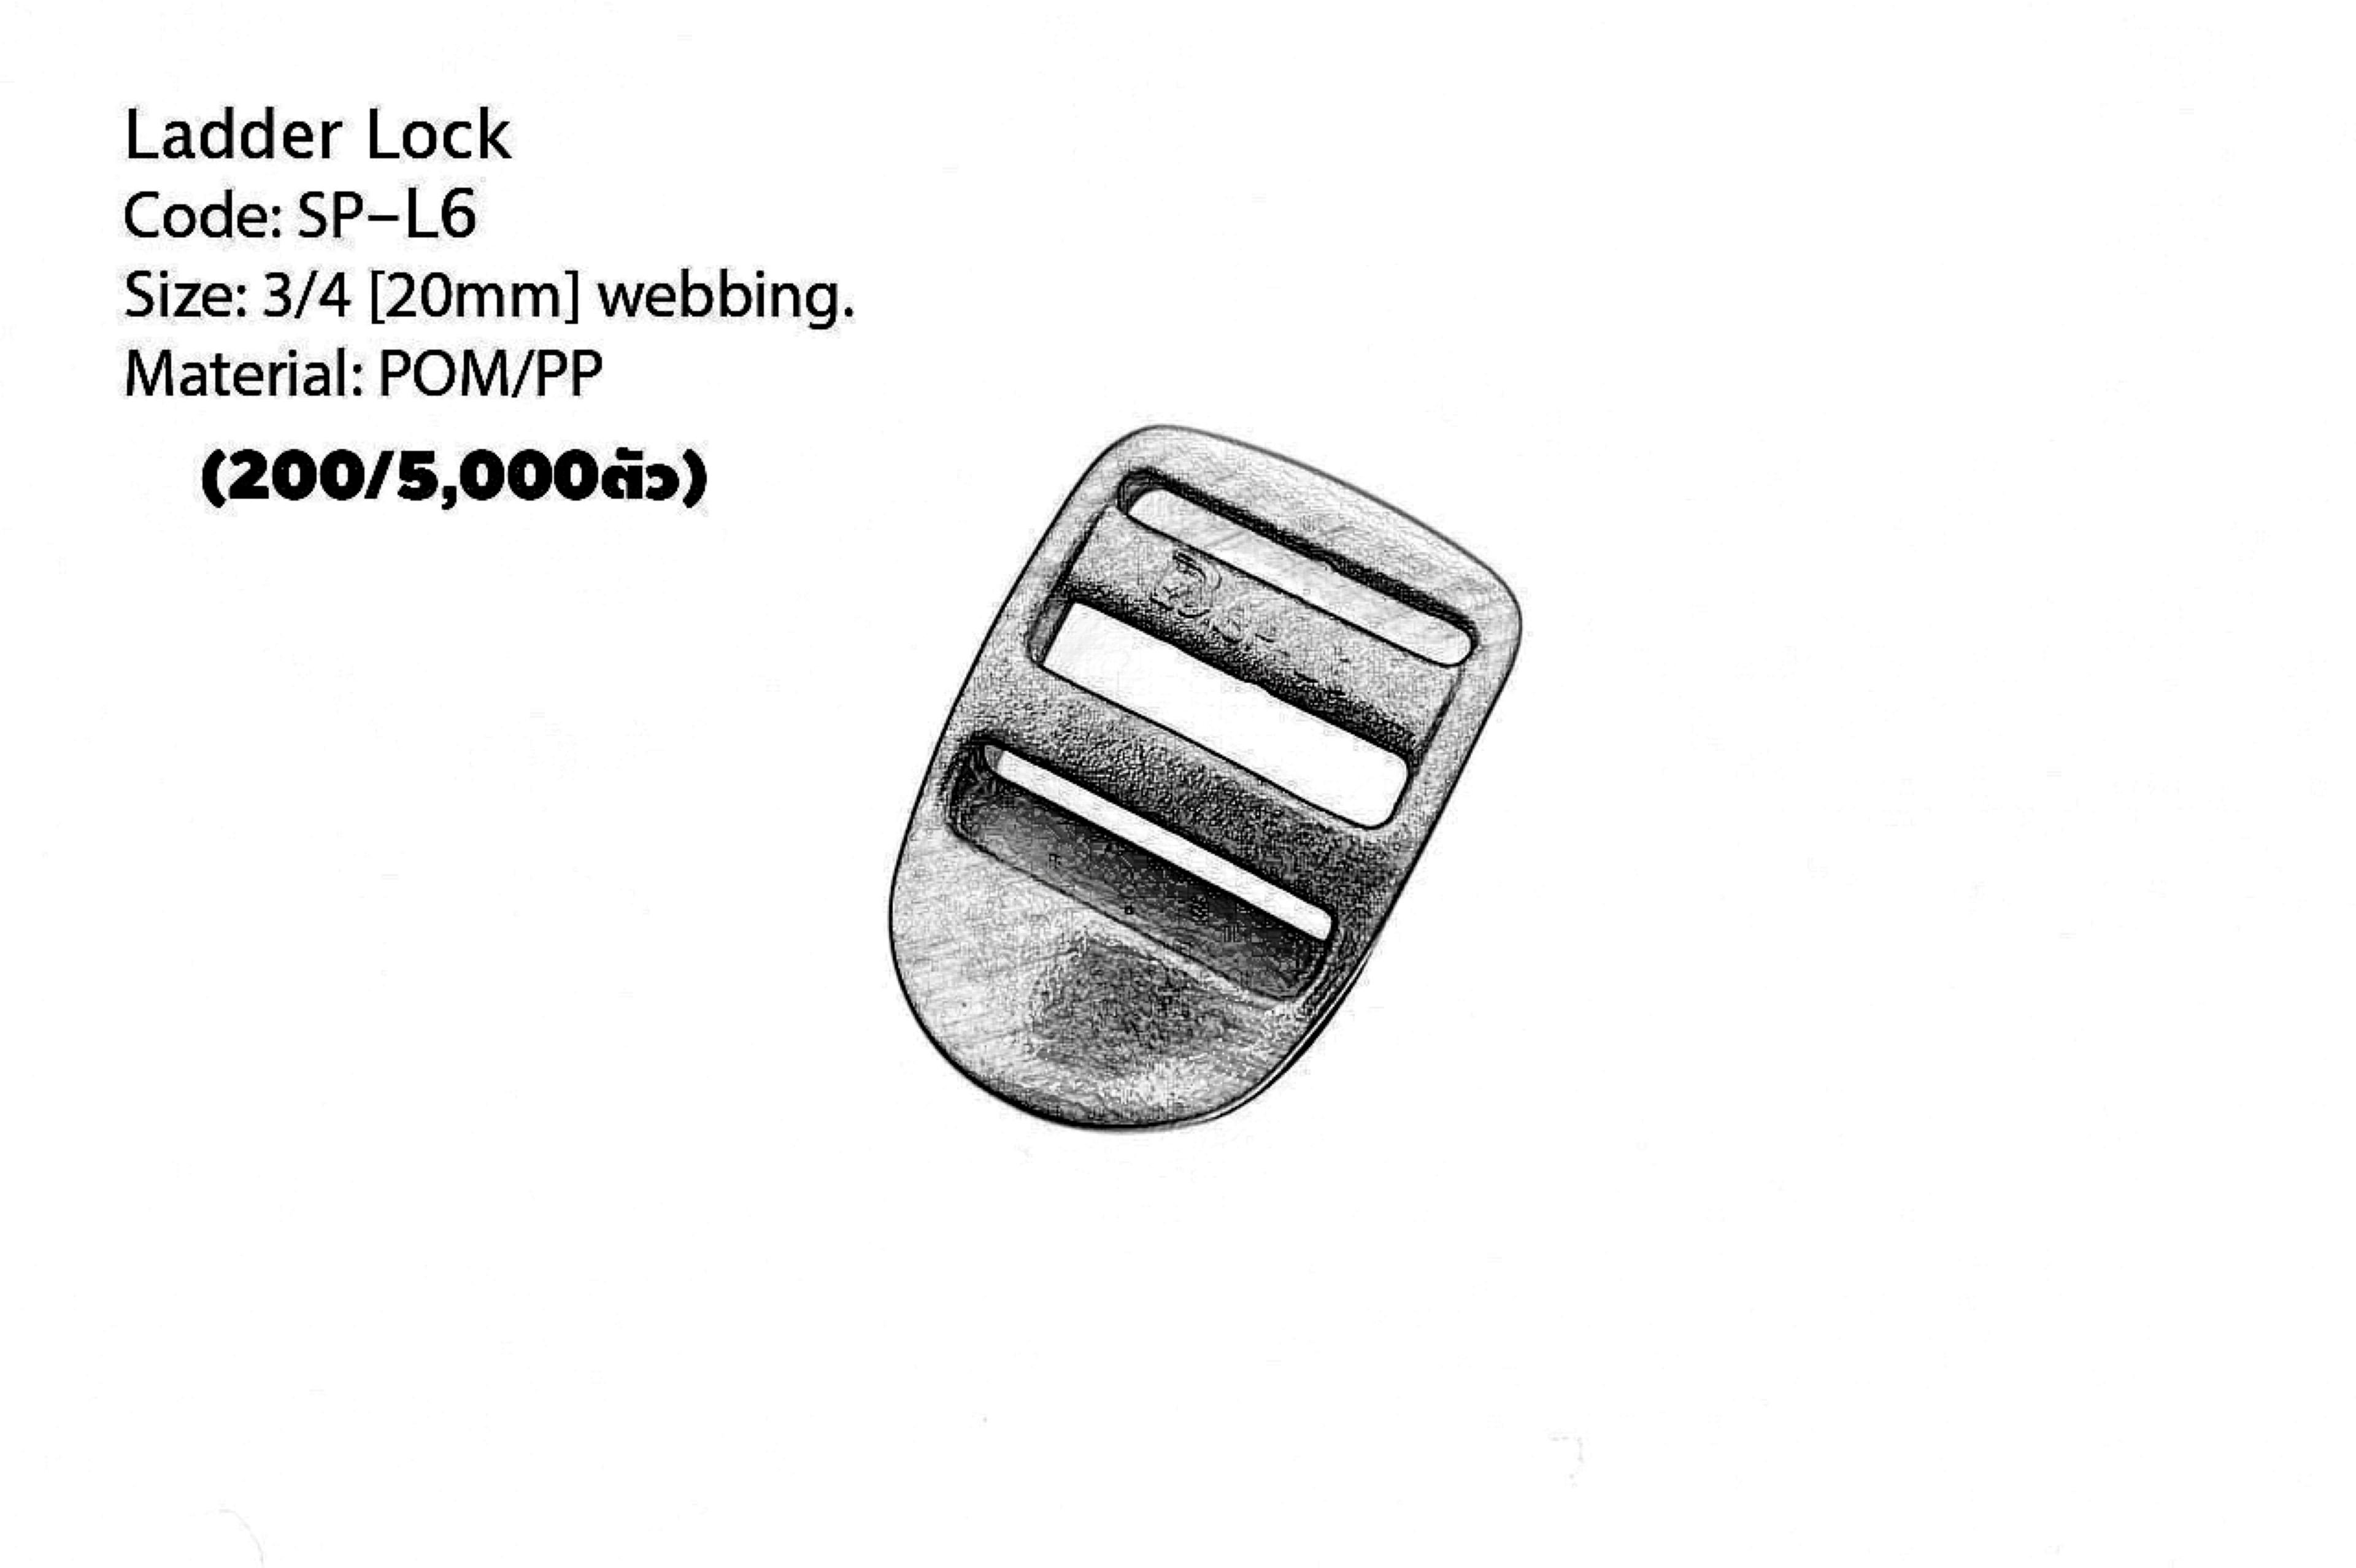 Ladder Lock 3/4